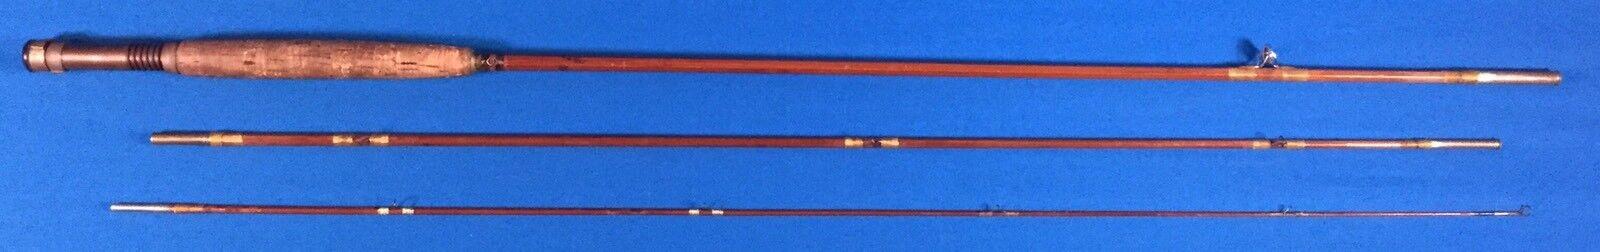 Vtg Heddon Bamboo Fly Rod 9 Foot 3 Piece Fishing Pole Cork